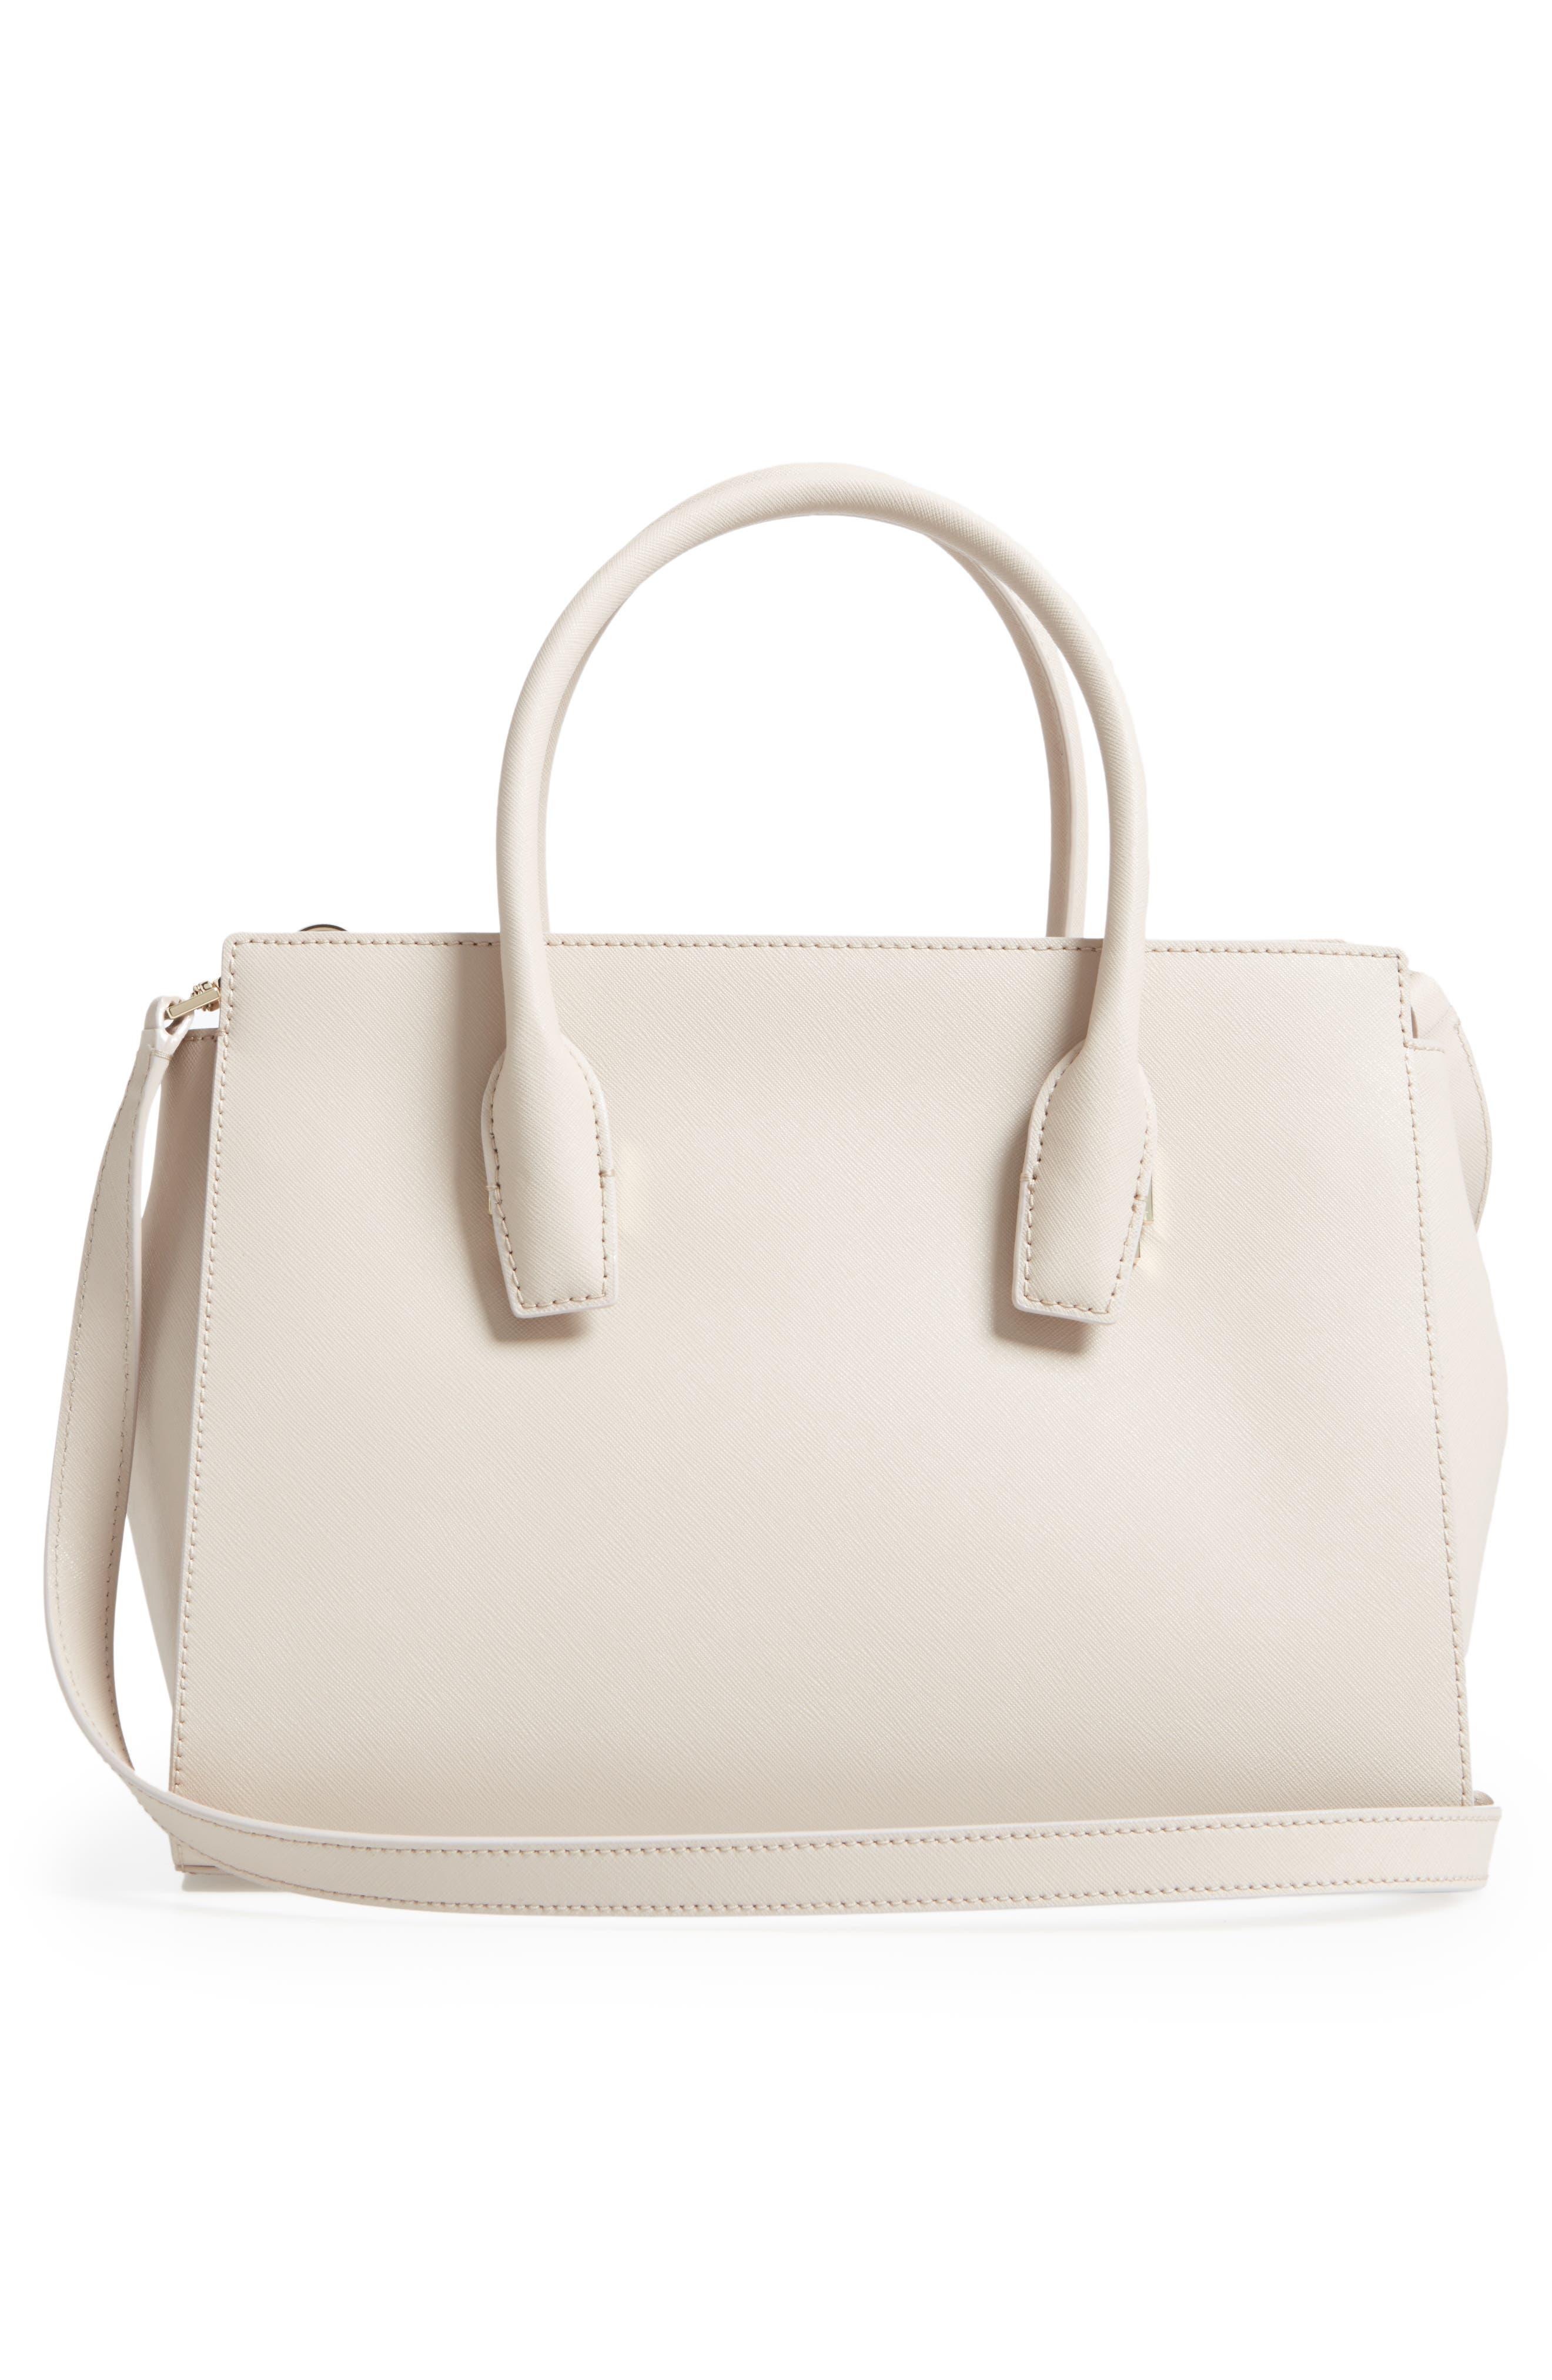 make it mine - candace leather satchel,                             Alternate thumbnail 6, color,